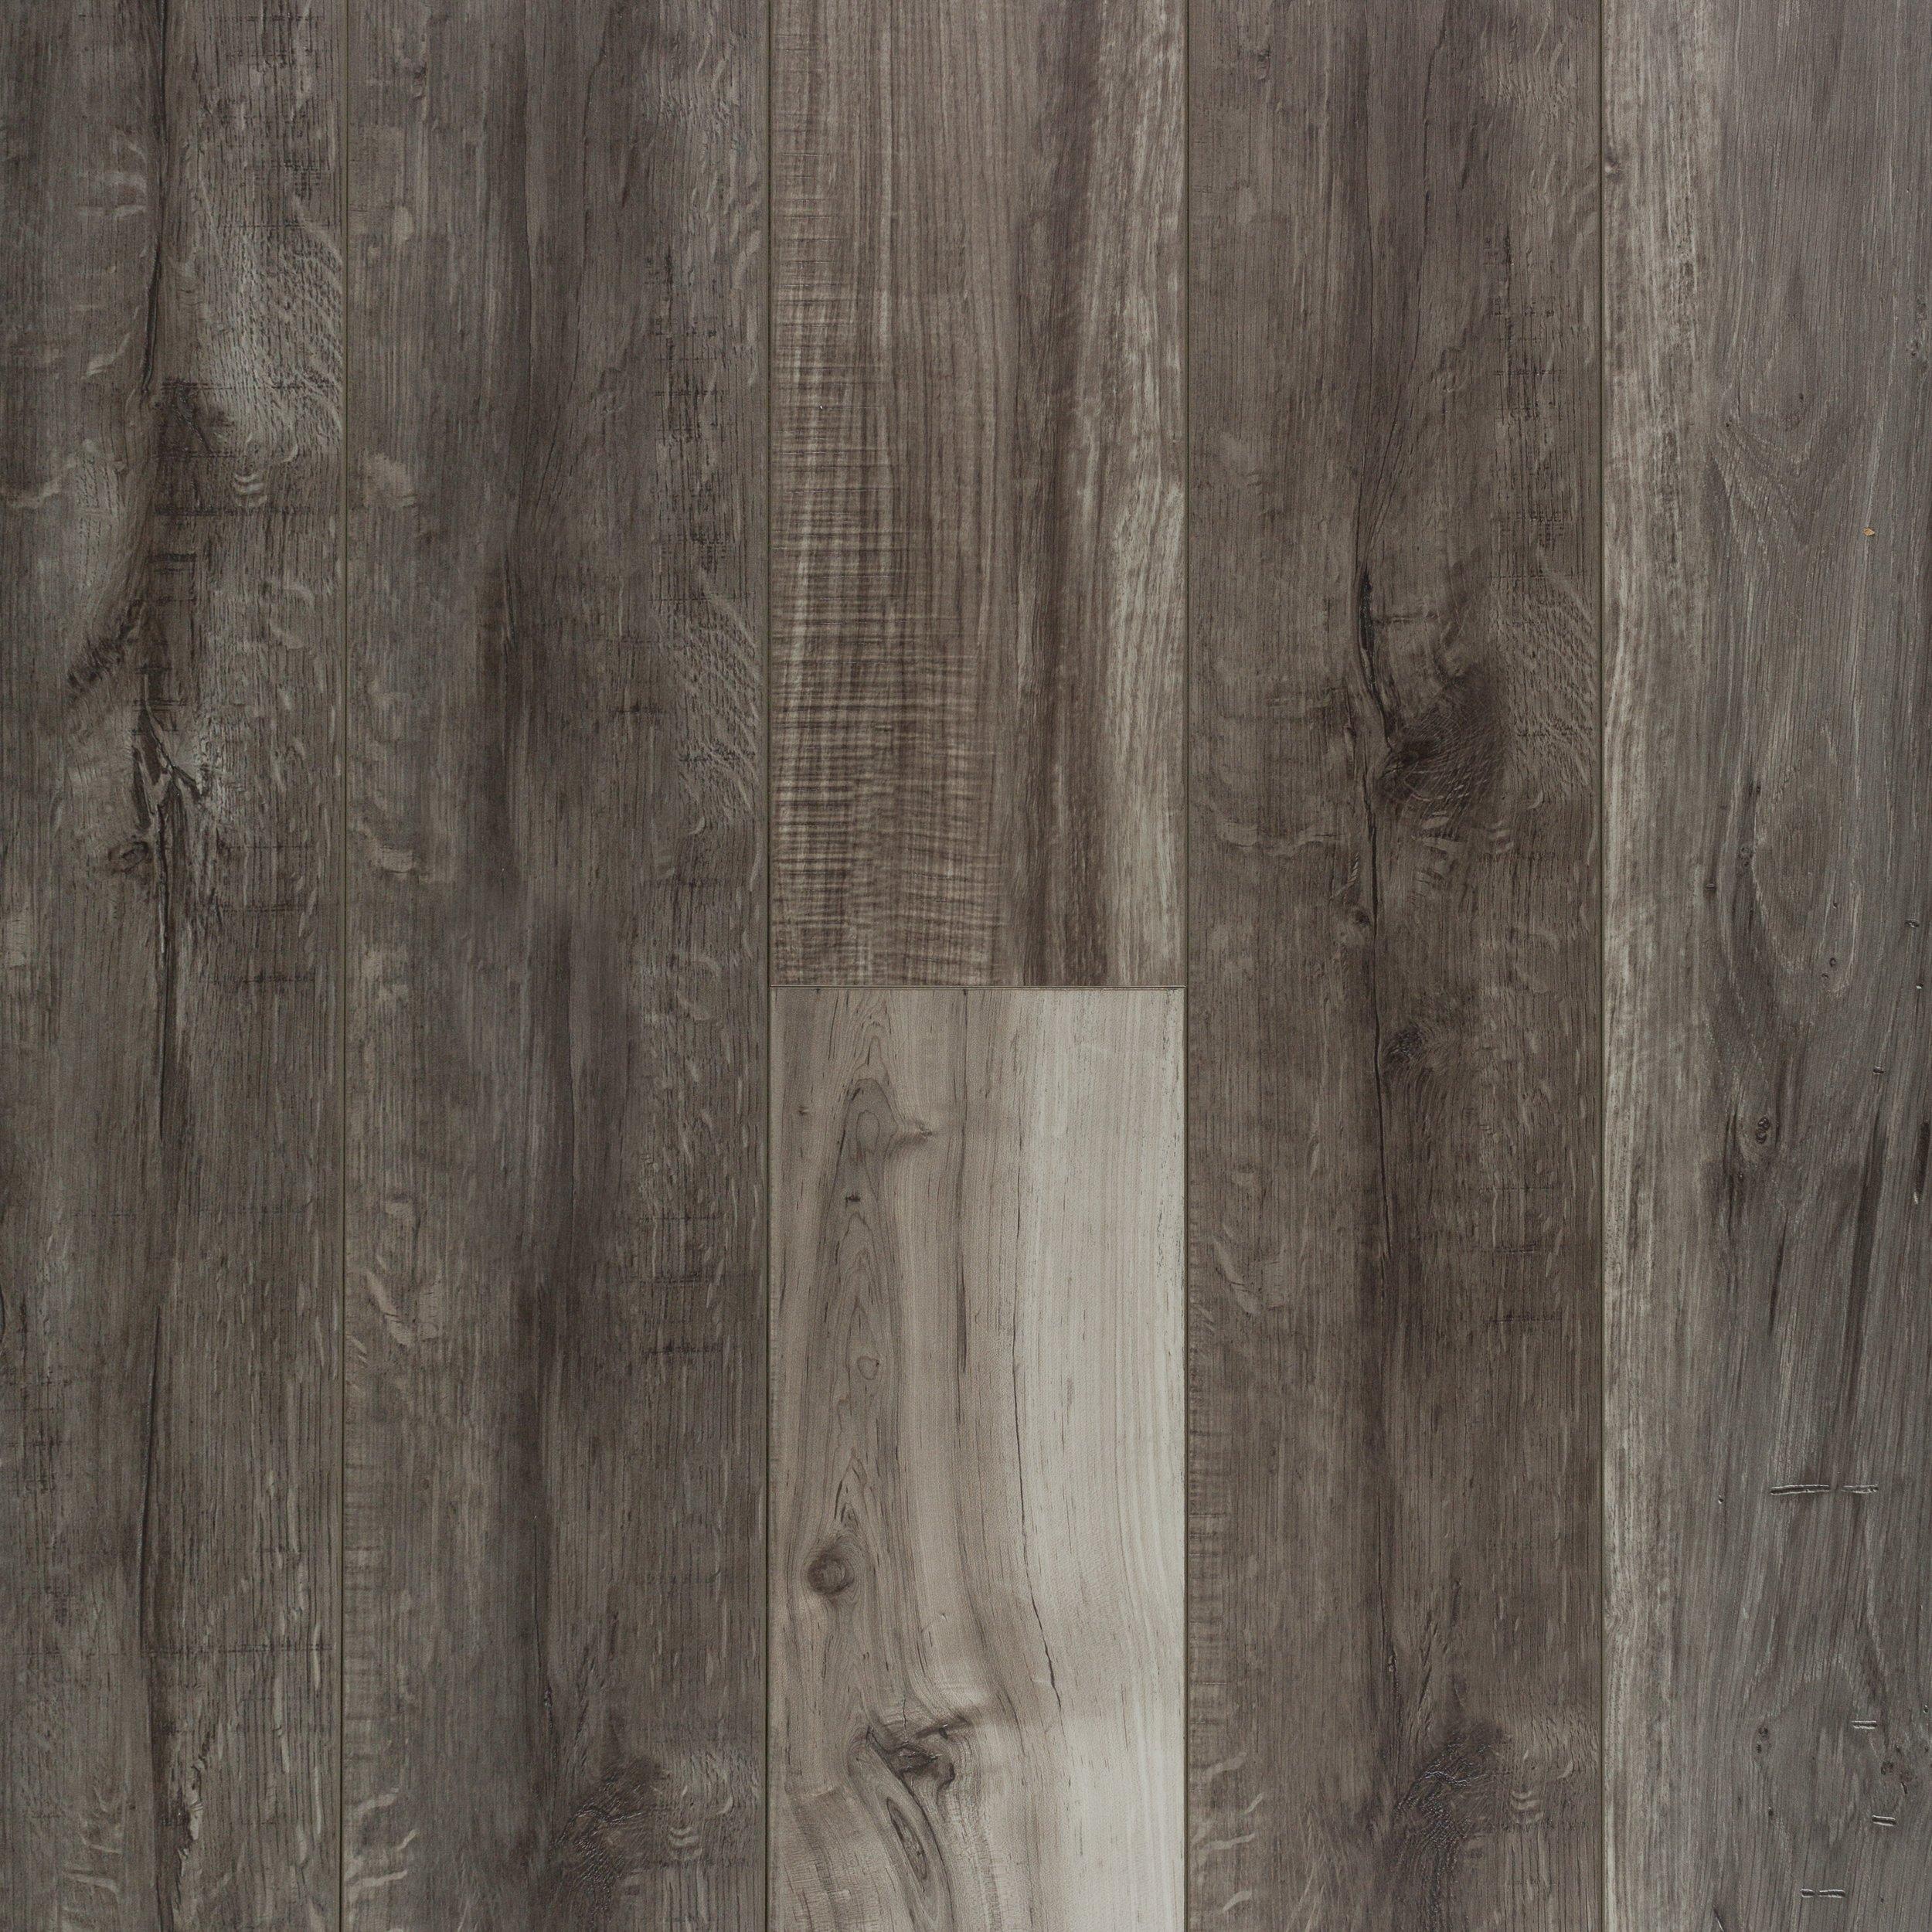 Kennecott Water Resistant Laminate In 2020 Flooring Floor Decor Grey Flooring